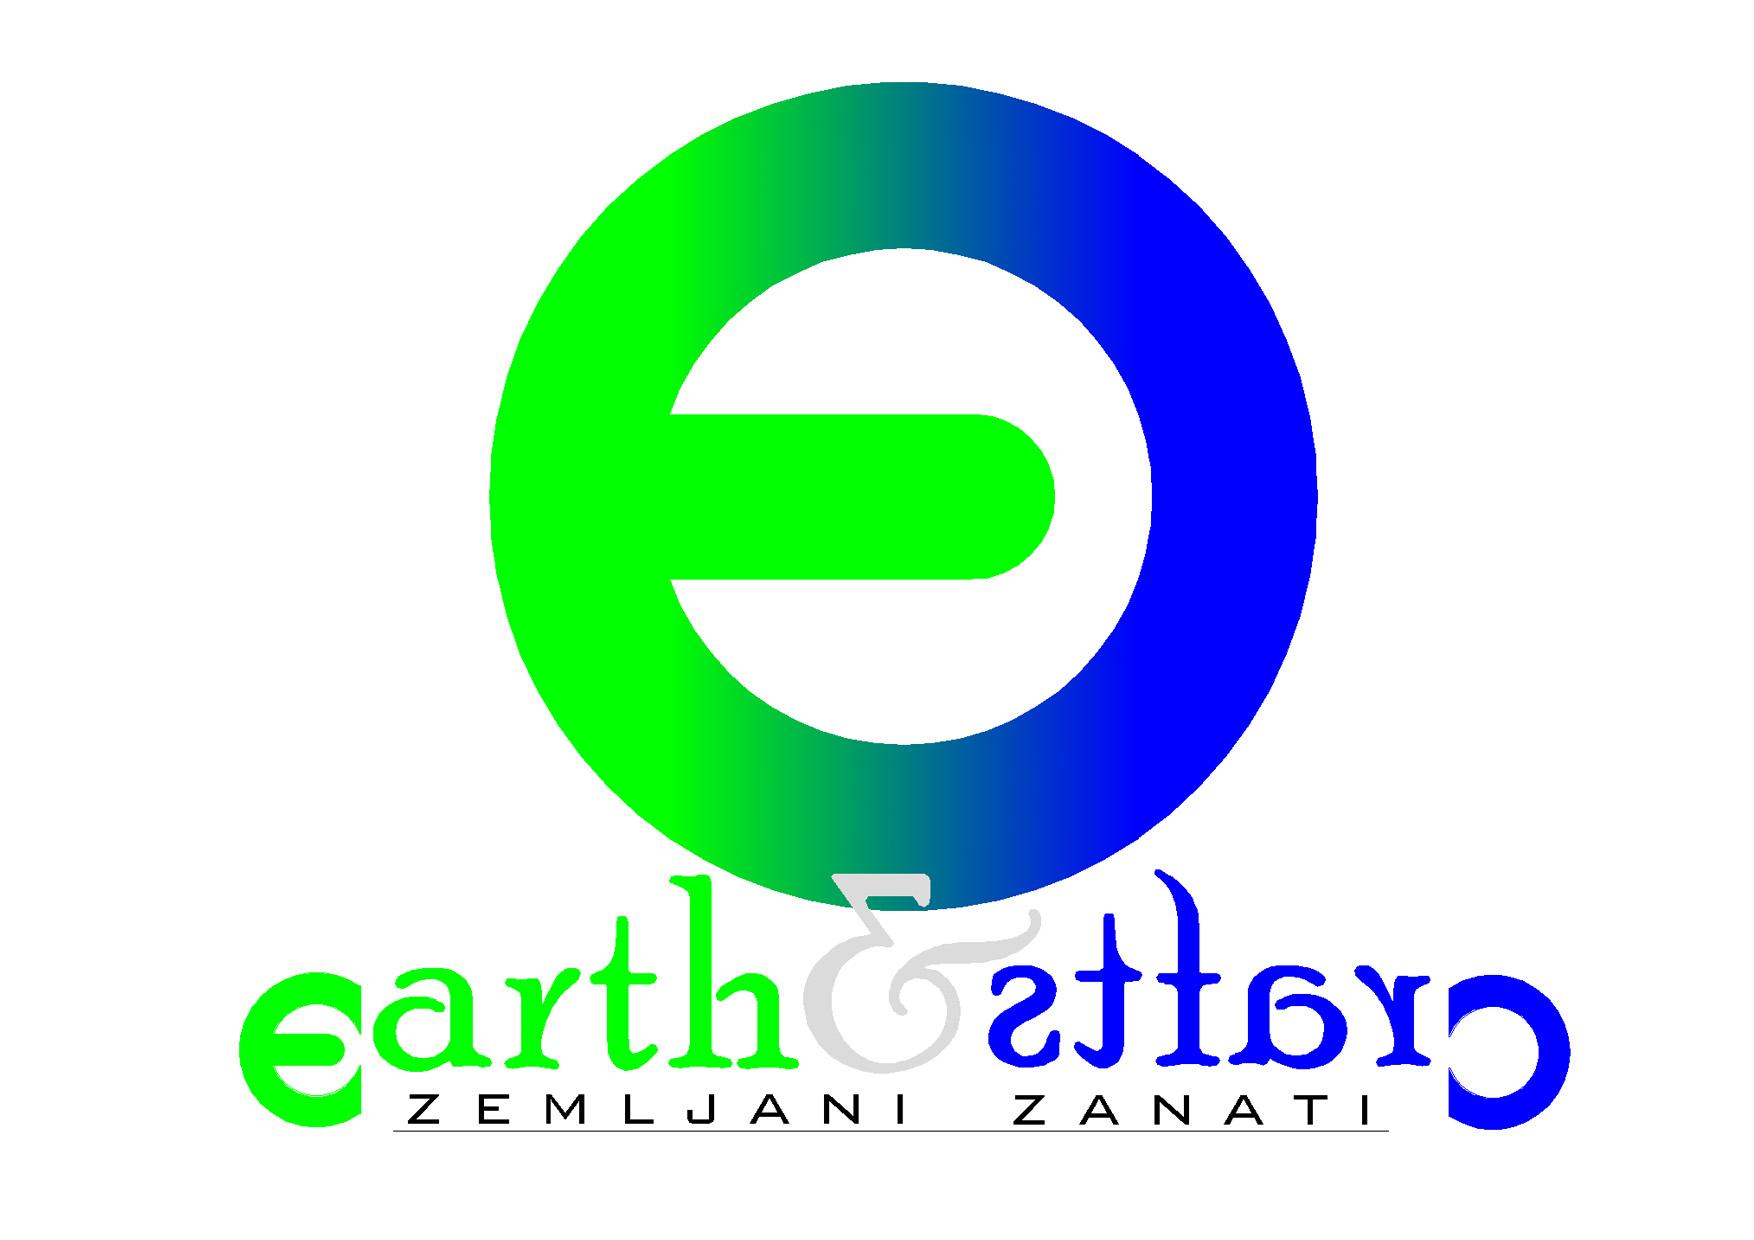 12 predlog logo EARTH&CRAFTS neverovatni boris neverovatniboris@gmail.com